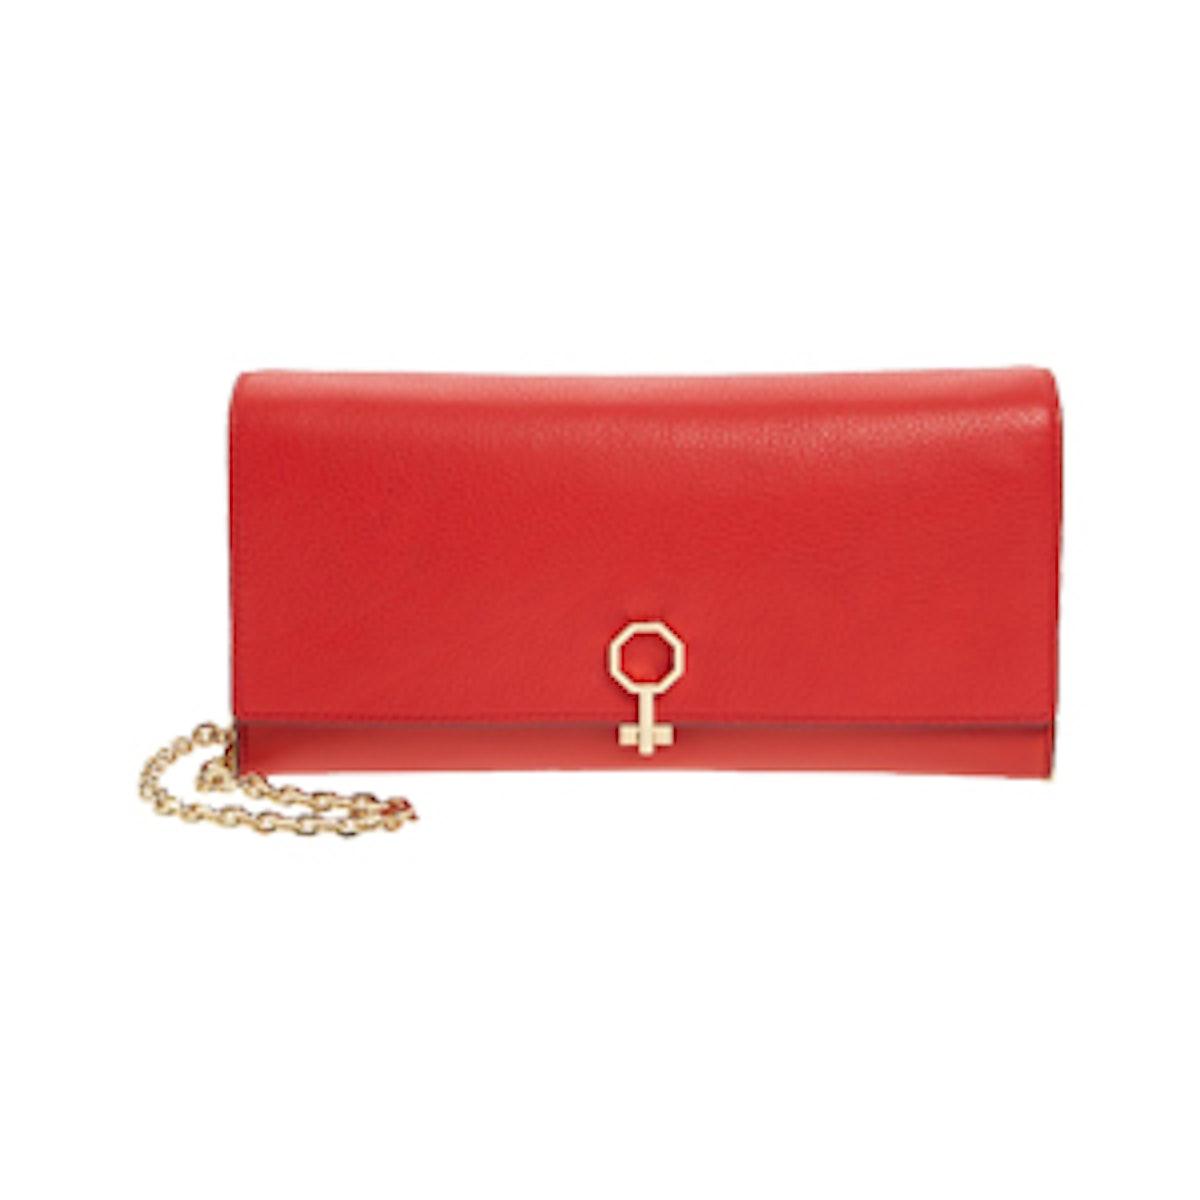 Yvet Leather Flap Clutch